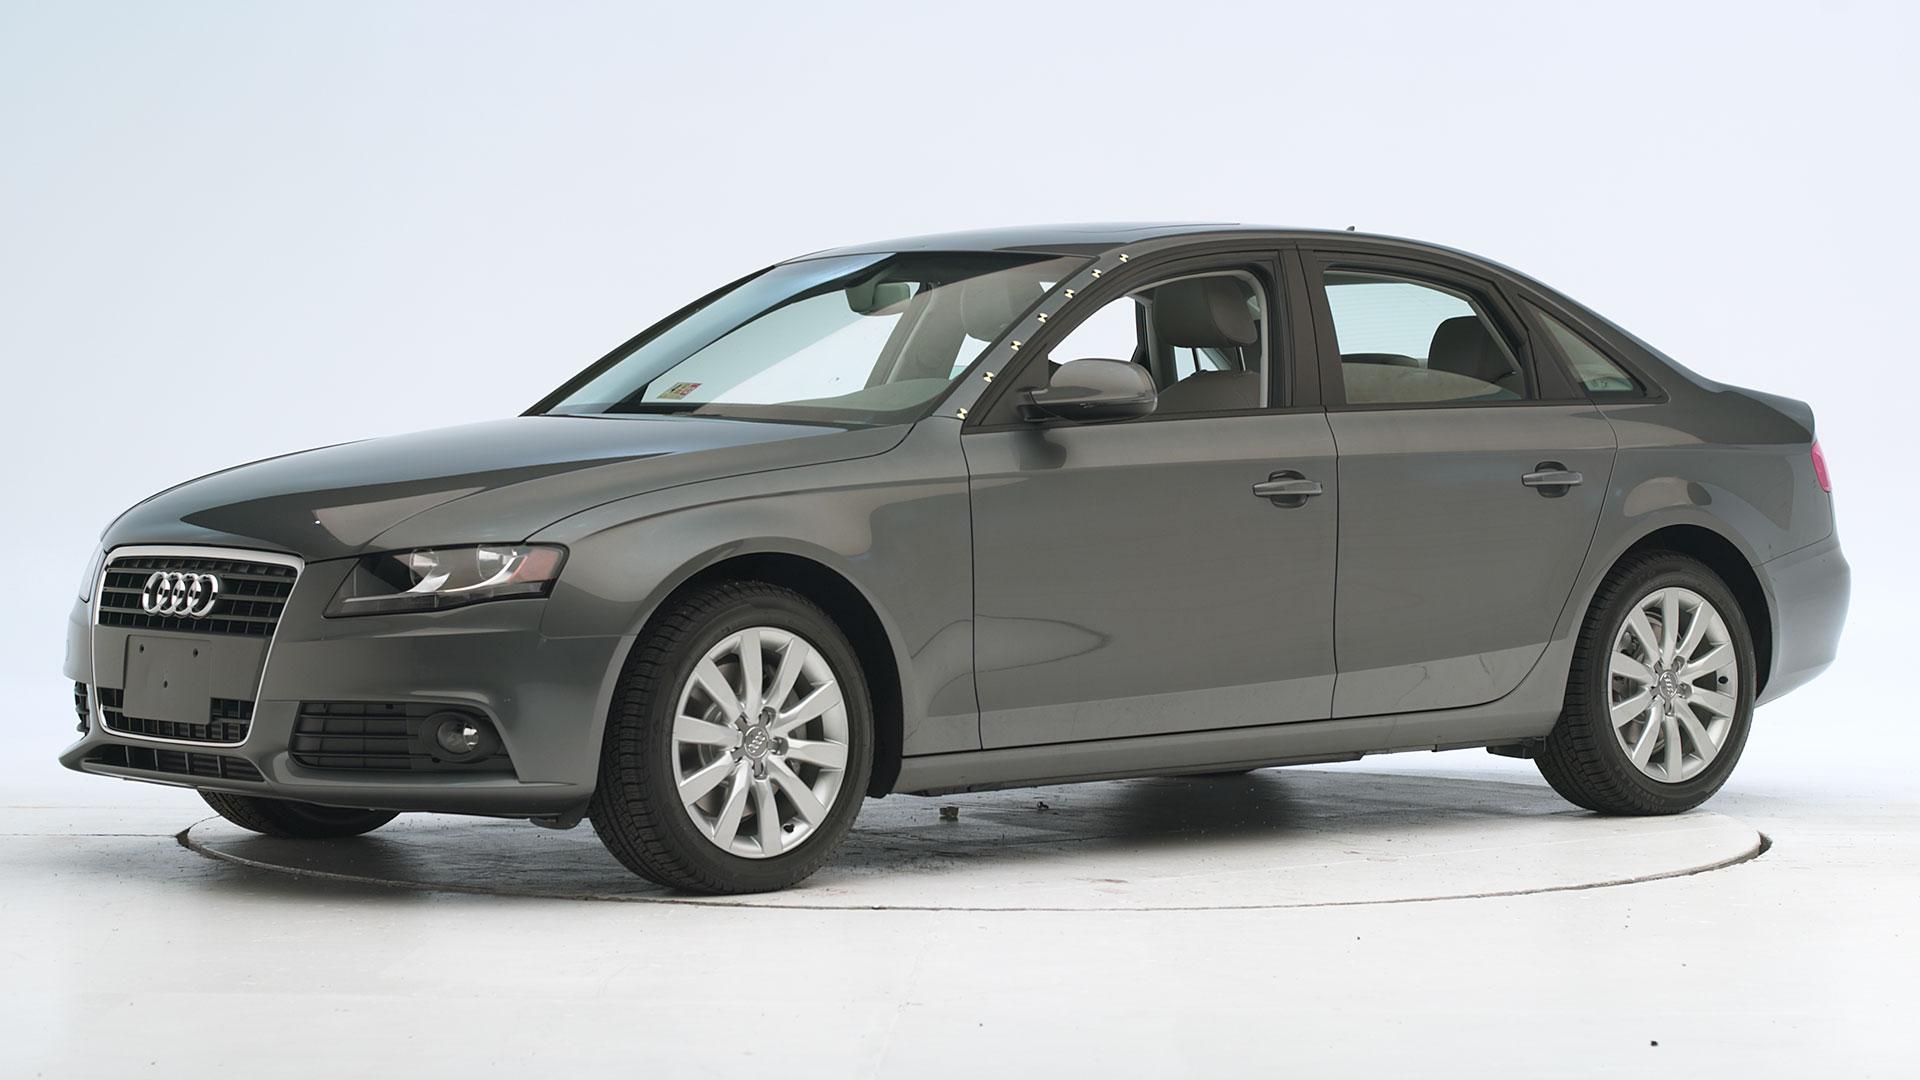 Kelebihan Audi A4 2012 Tangguh